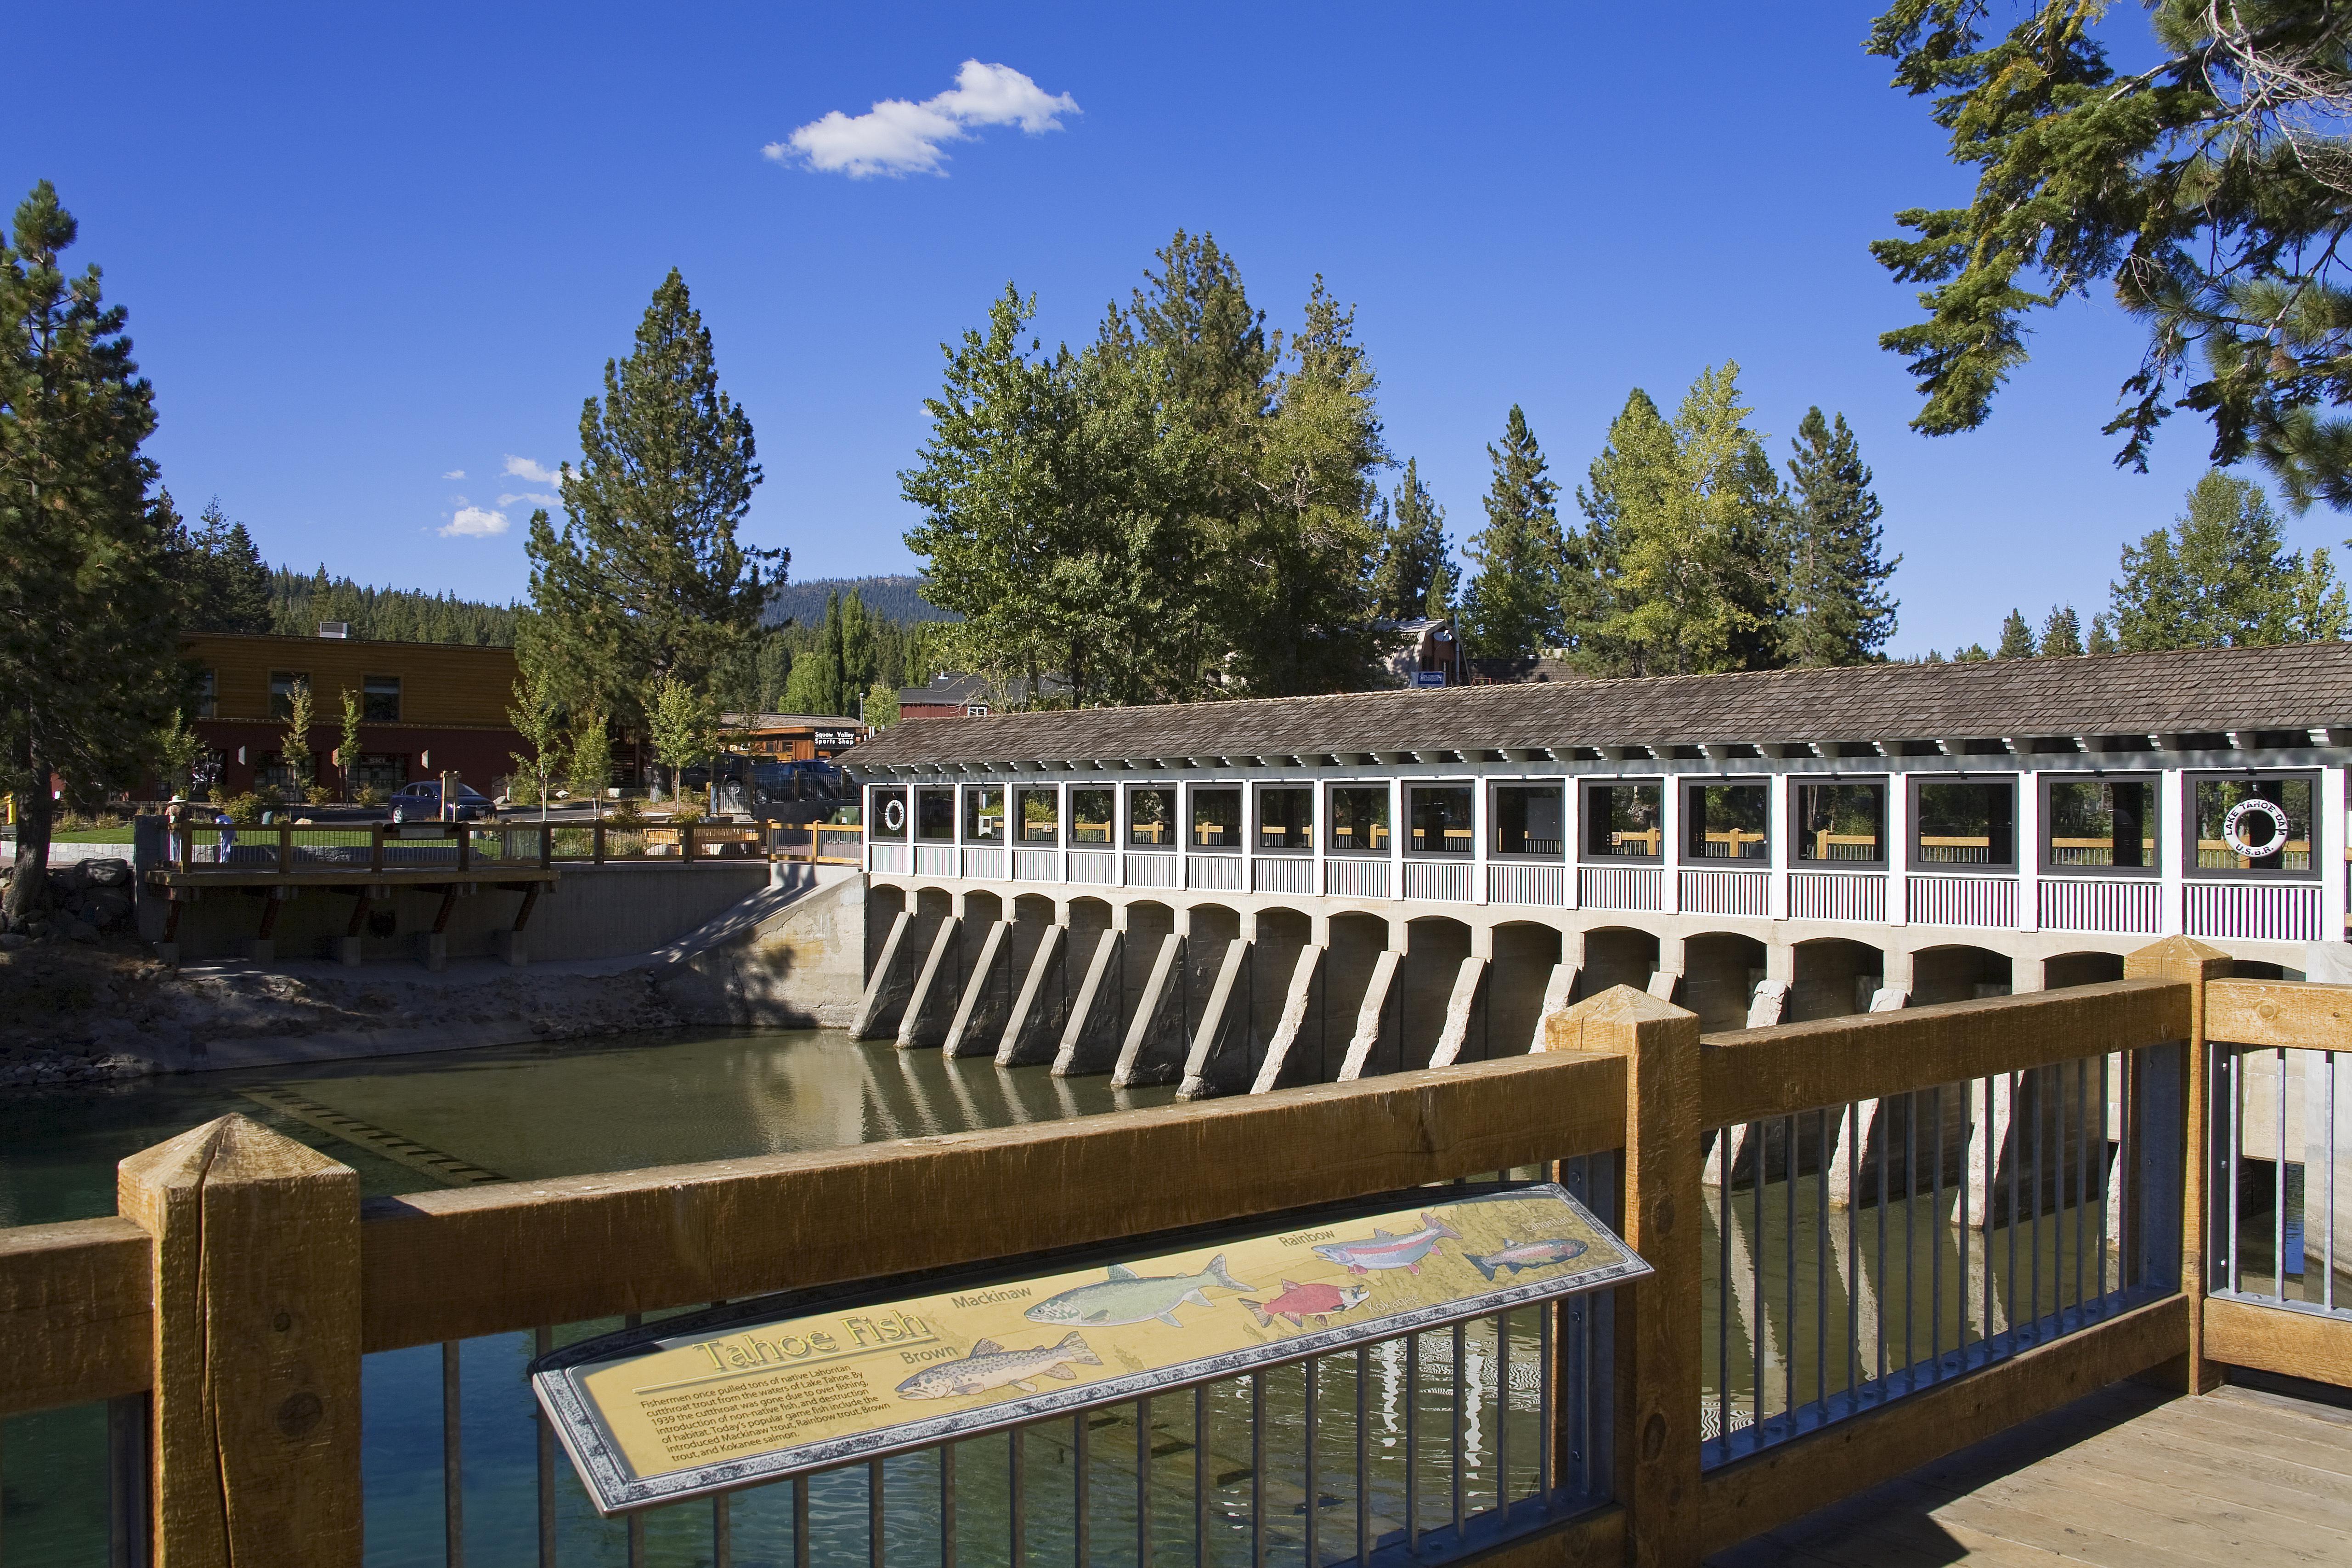 tahoe city dam on truckee river lake tahoe 58c6f40e3df78c353cbd49c9